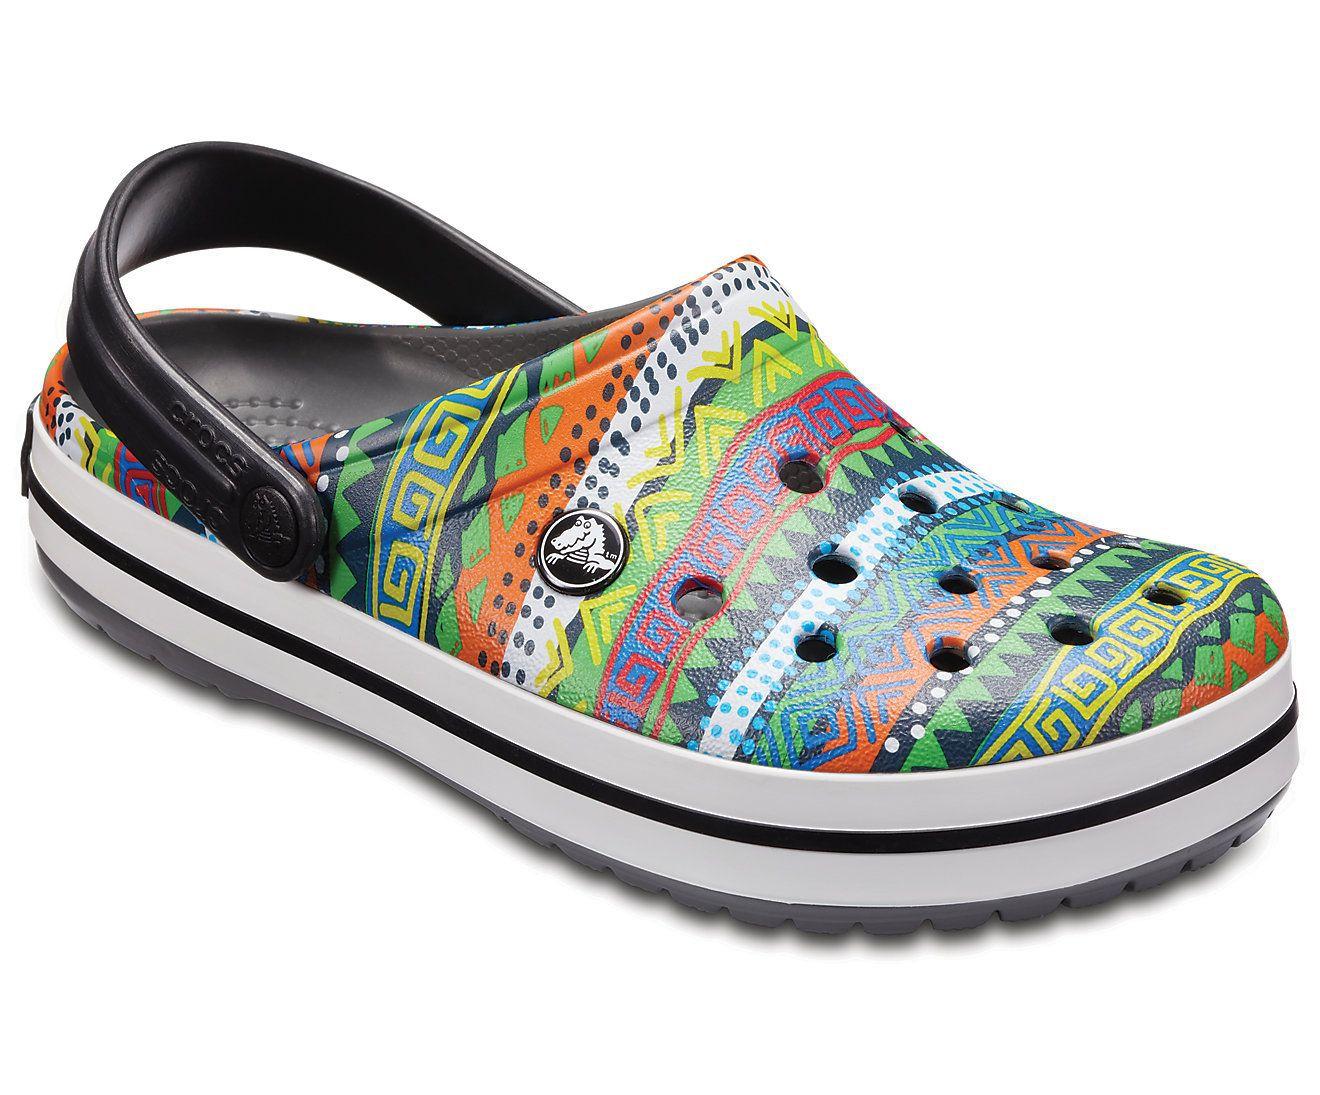 Sandália Crocs Graphic Clog Slate Grey - Black